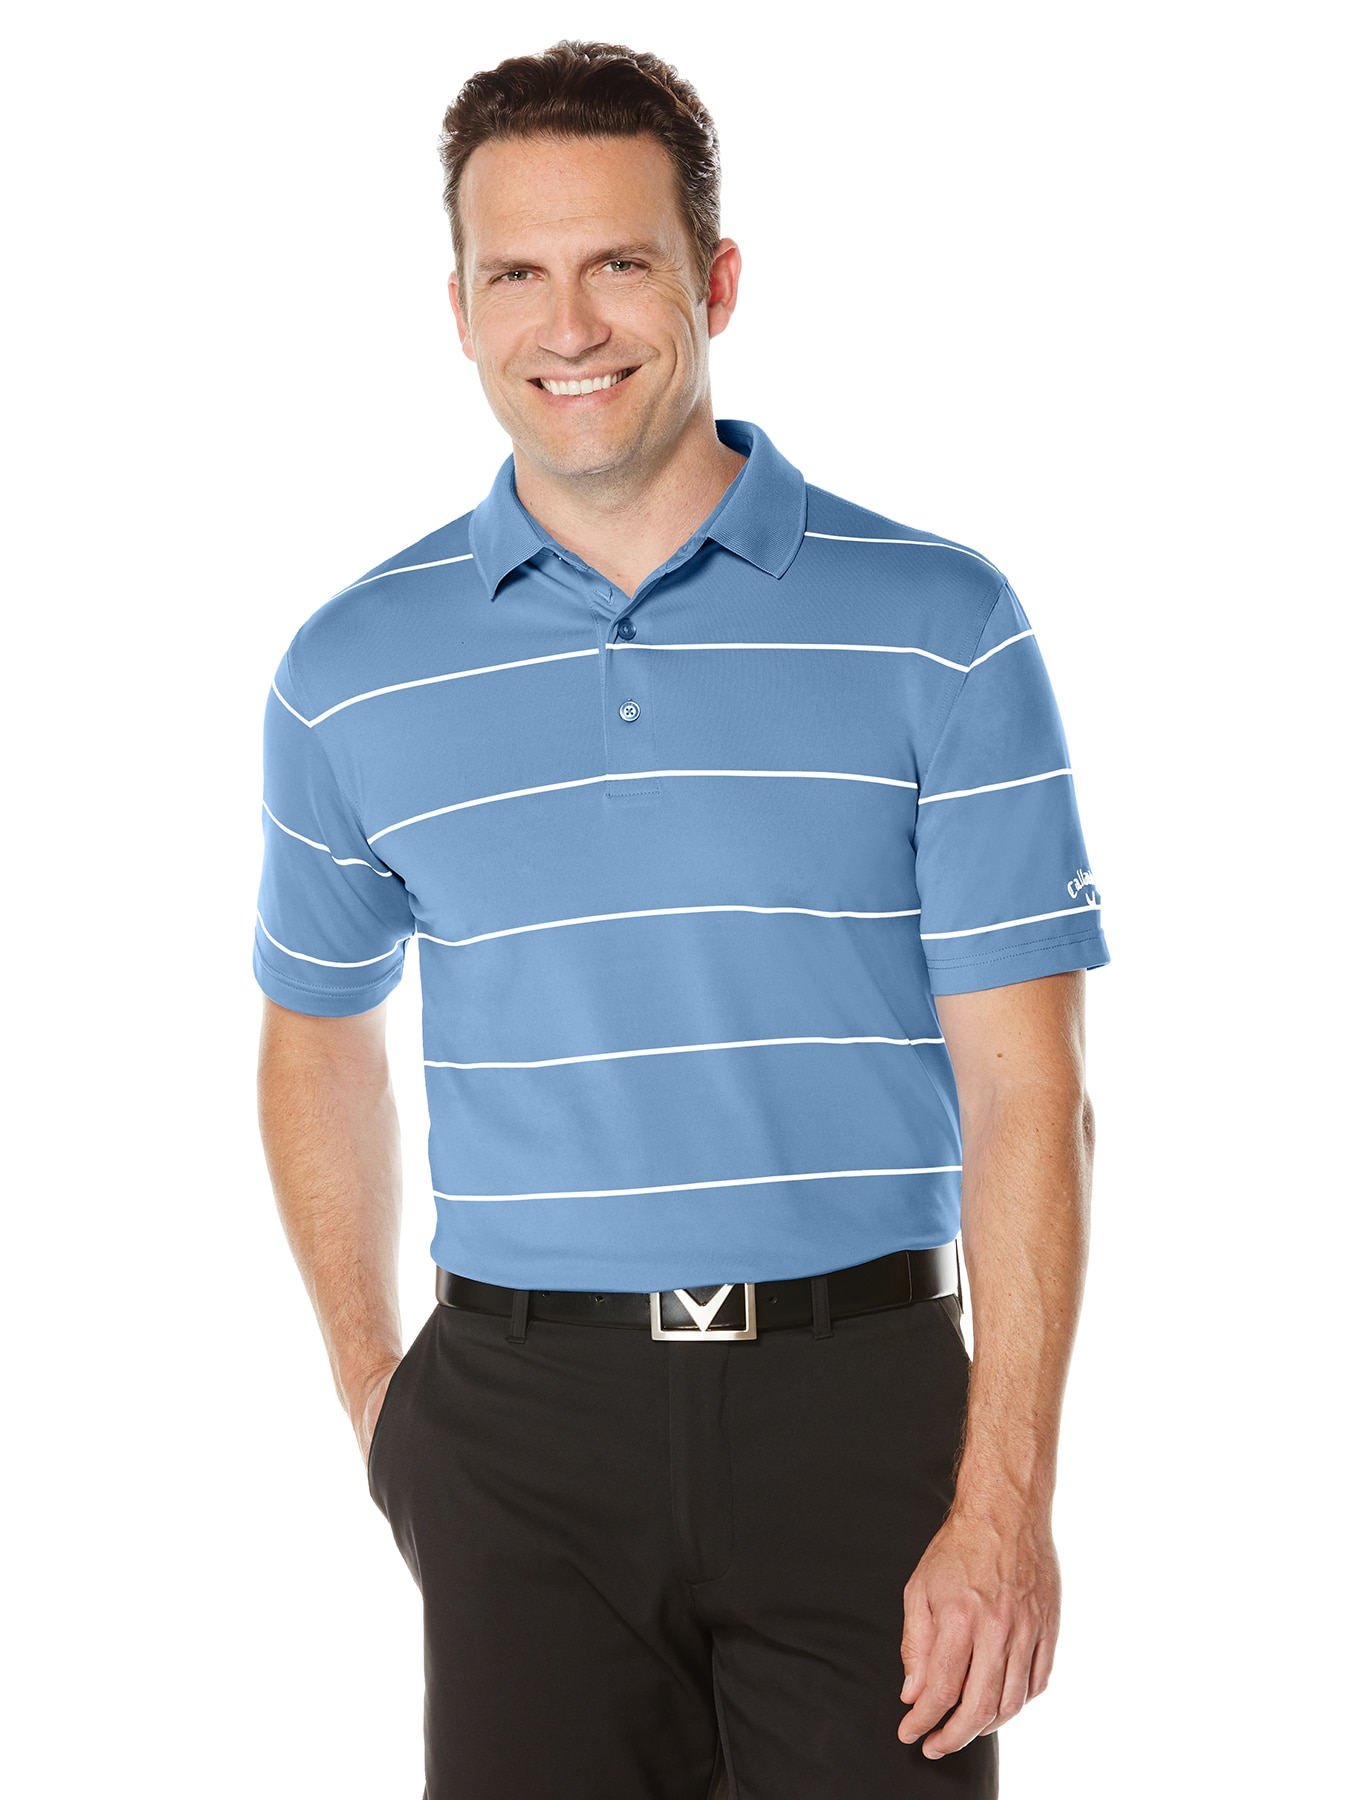 Callaway golf Callaway Athletic Jersey pánské golfové tričko modré Barva: Modrá, Velikost: M